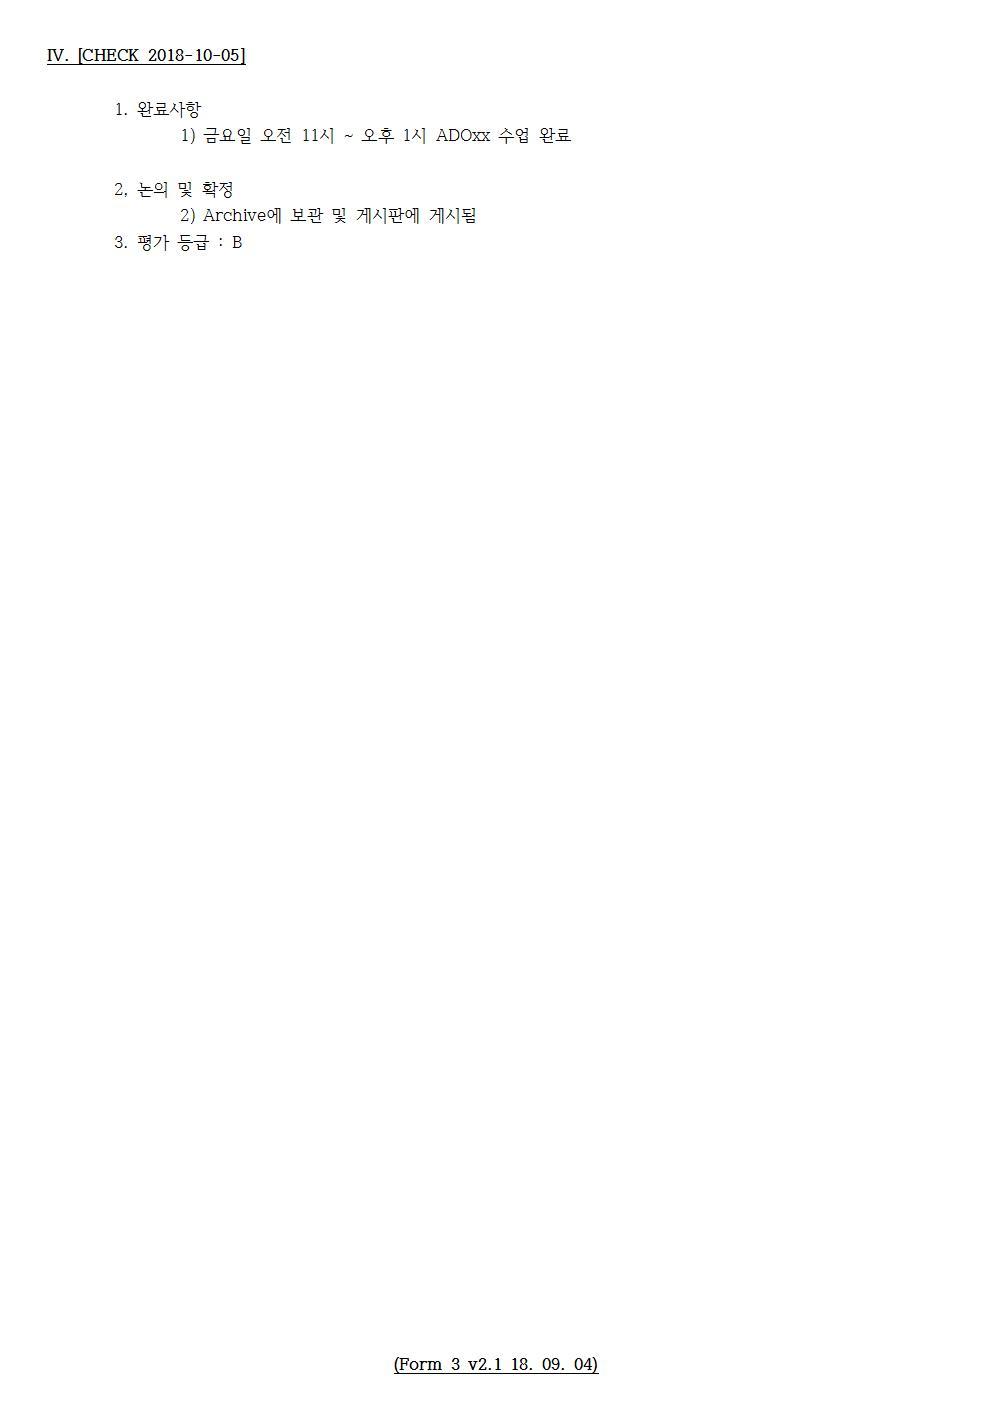 D-[18-049-LC-02]-[MM]-[2018-10-05][HH]002.jpg